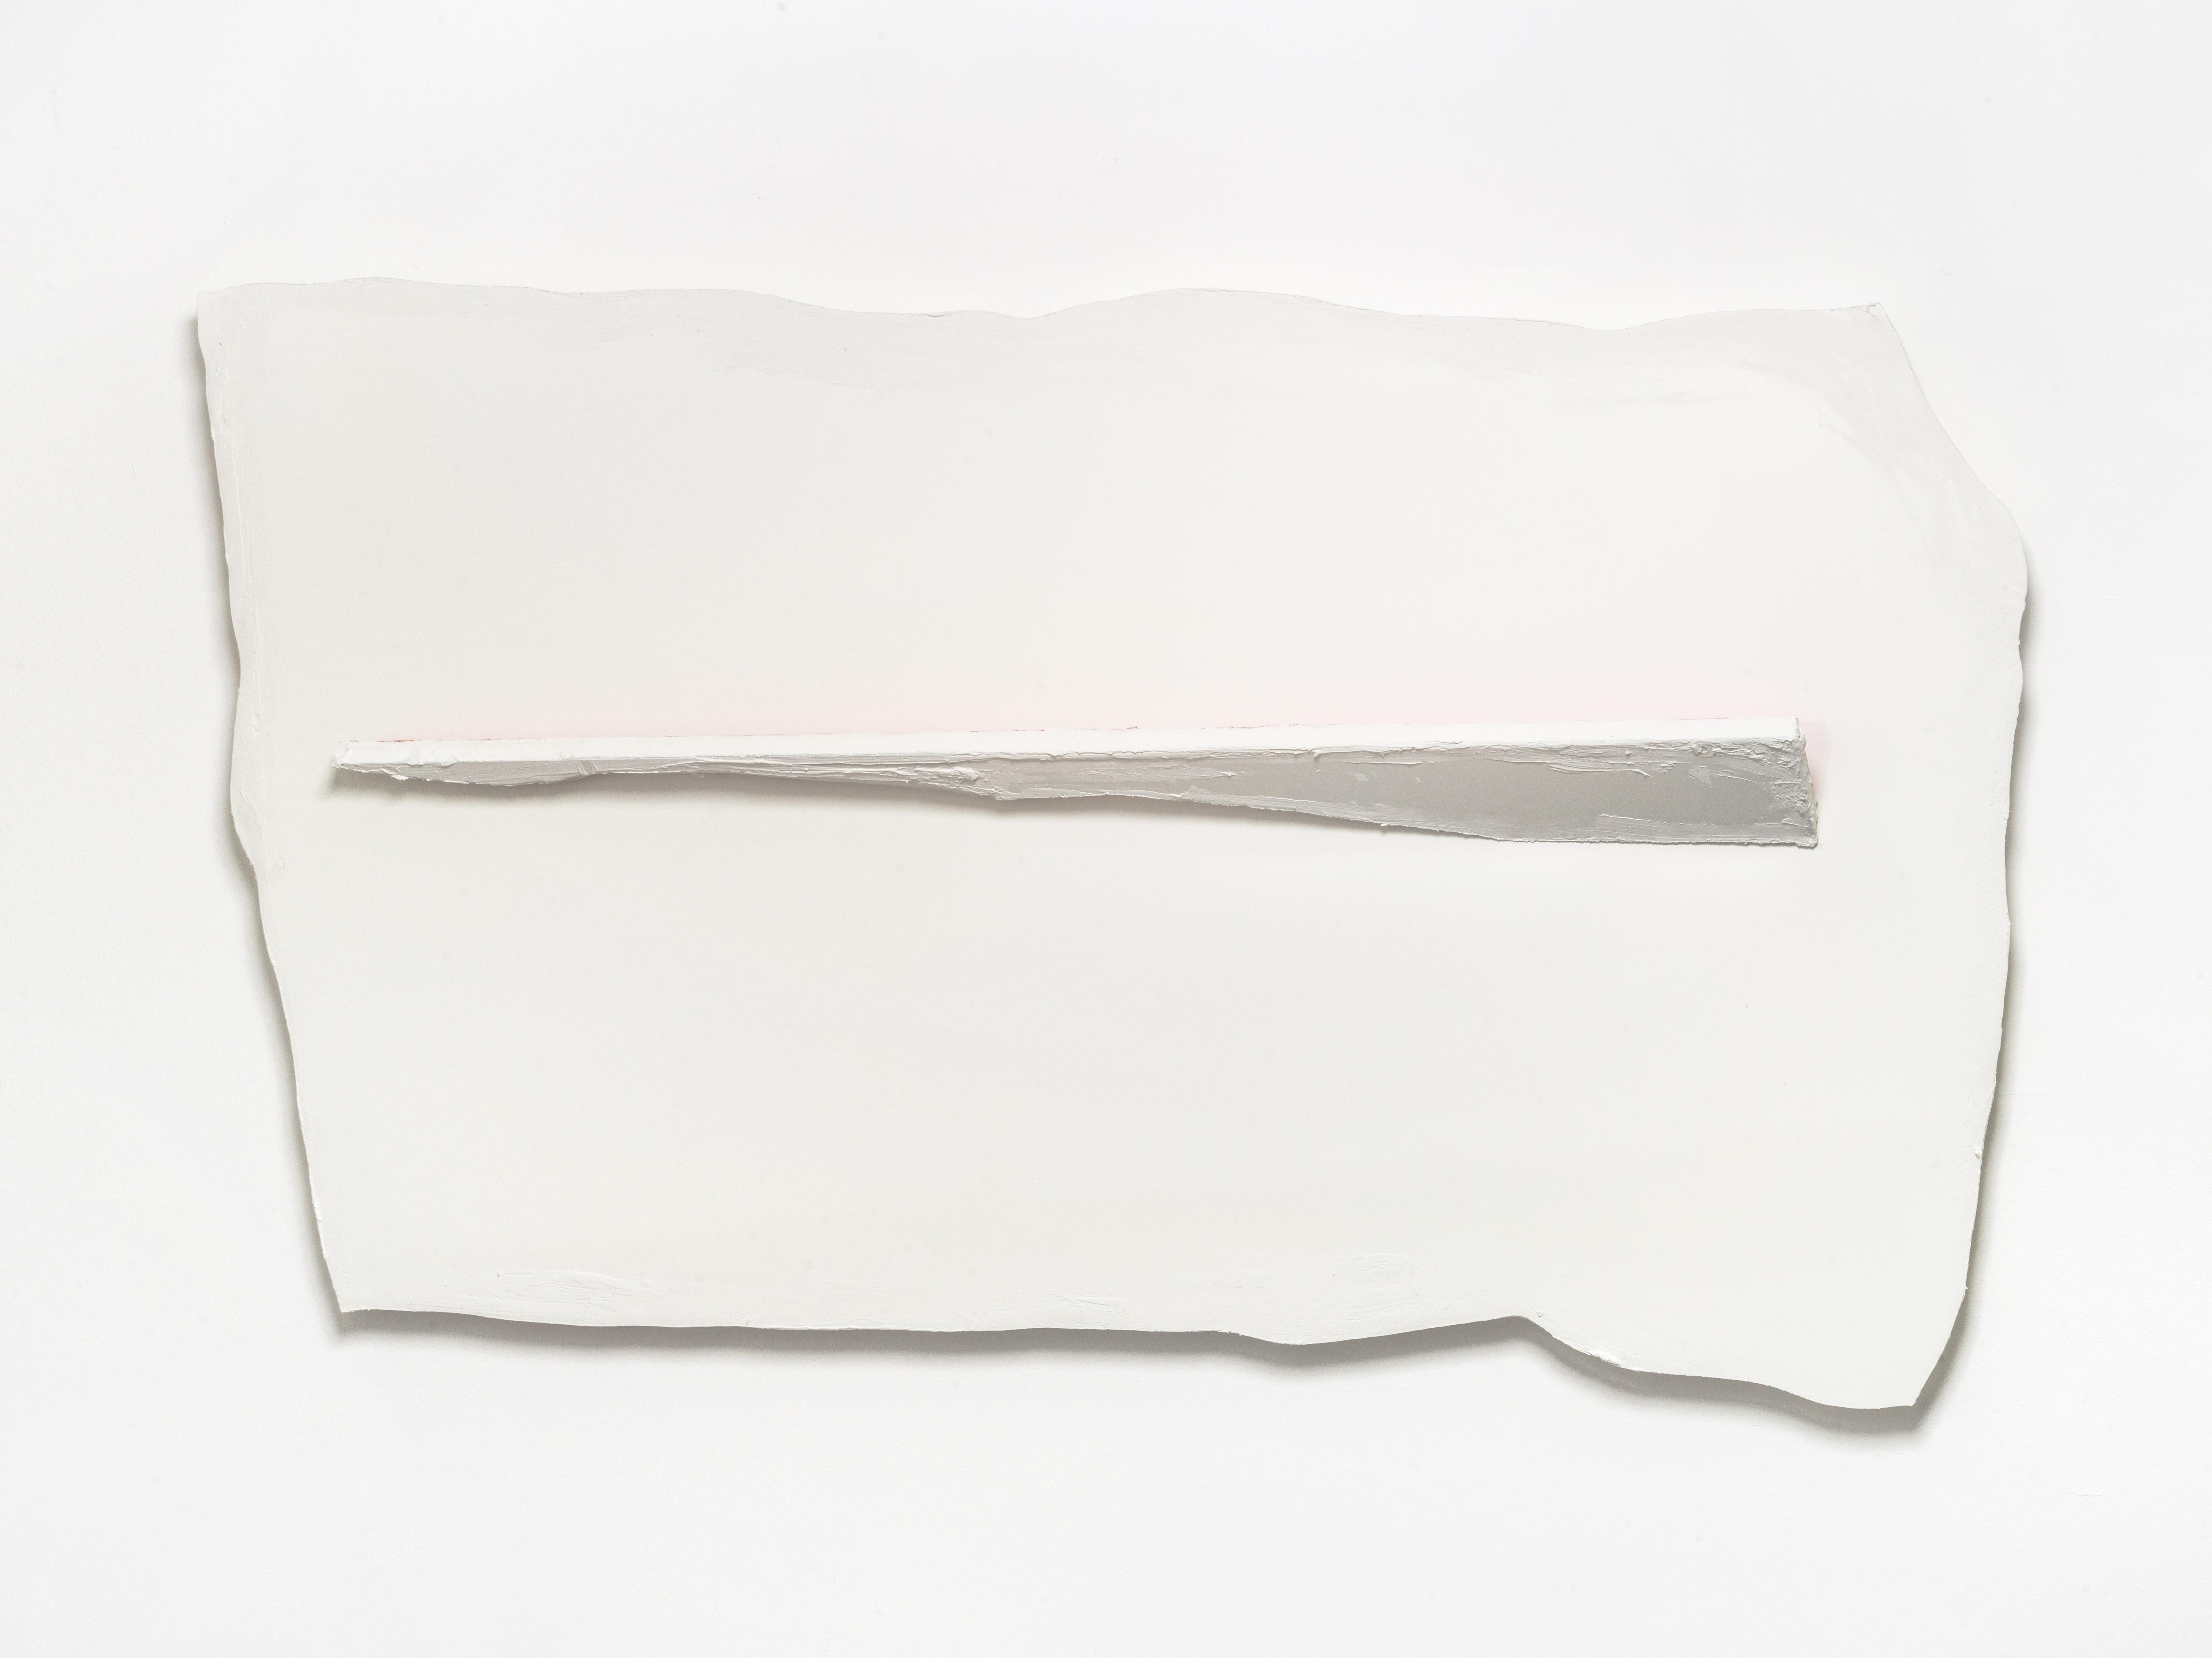 13. Adrian Altintas - AAD033 - 2021 - Untitled 88,2 x 149,4 x 5 cm. - Sandwichpanel, Acryl.